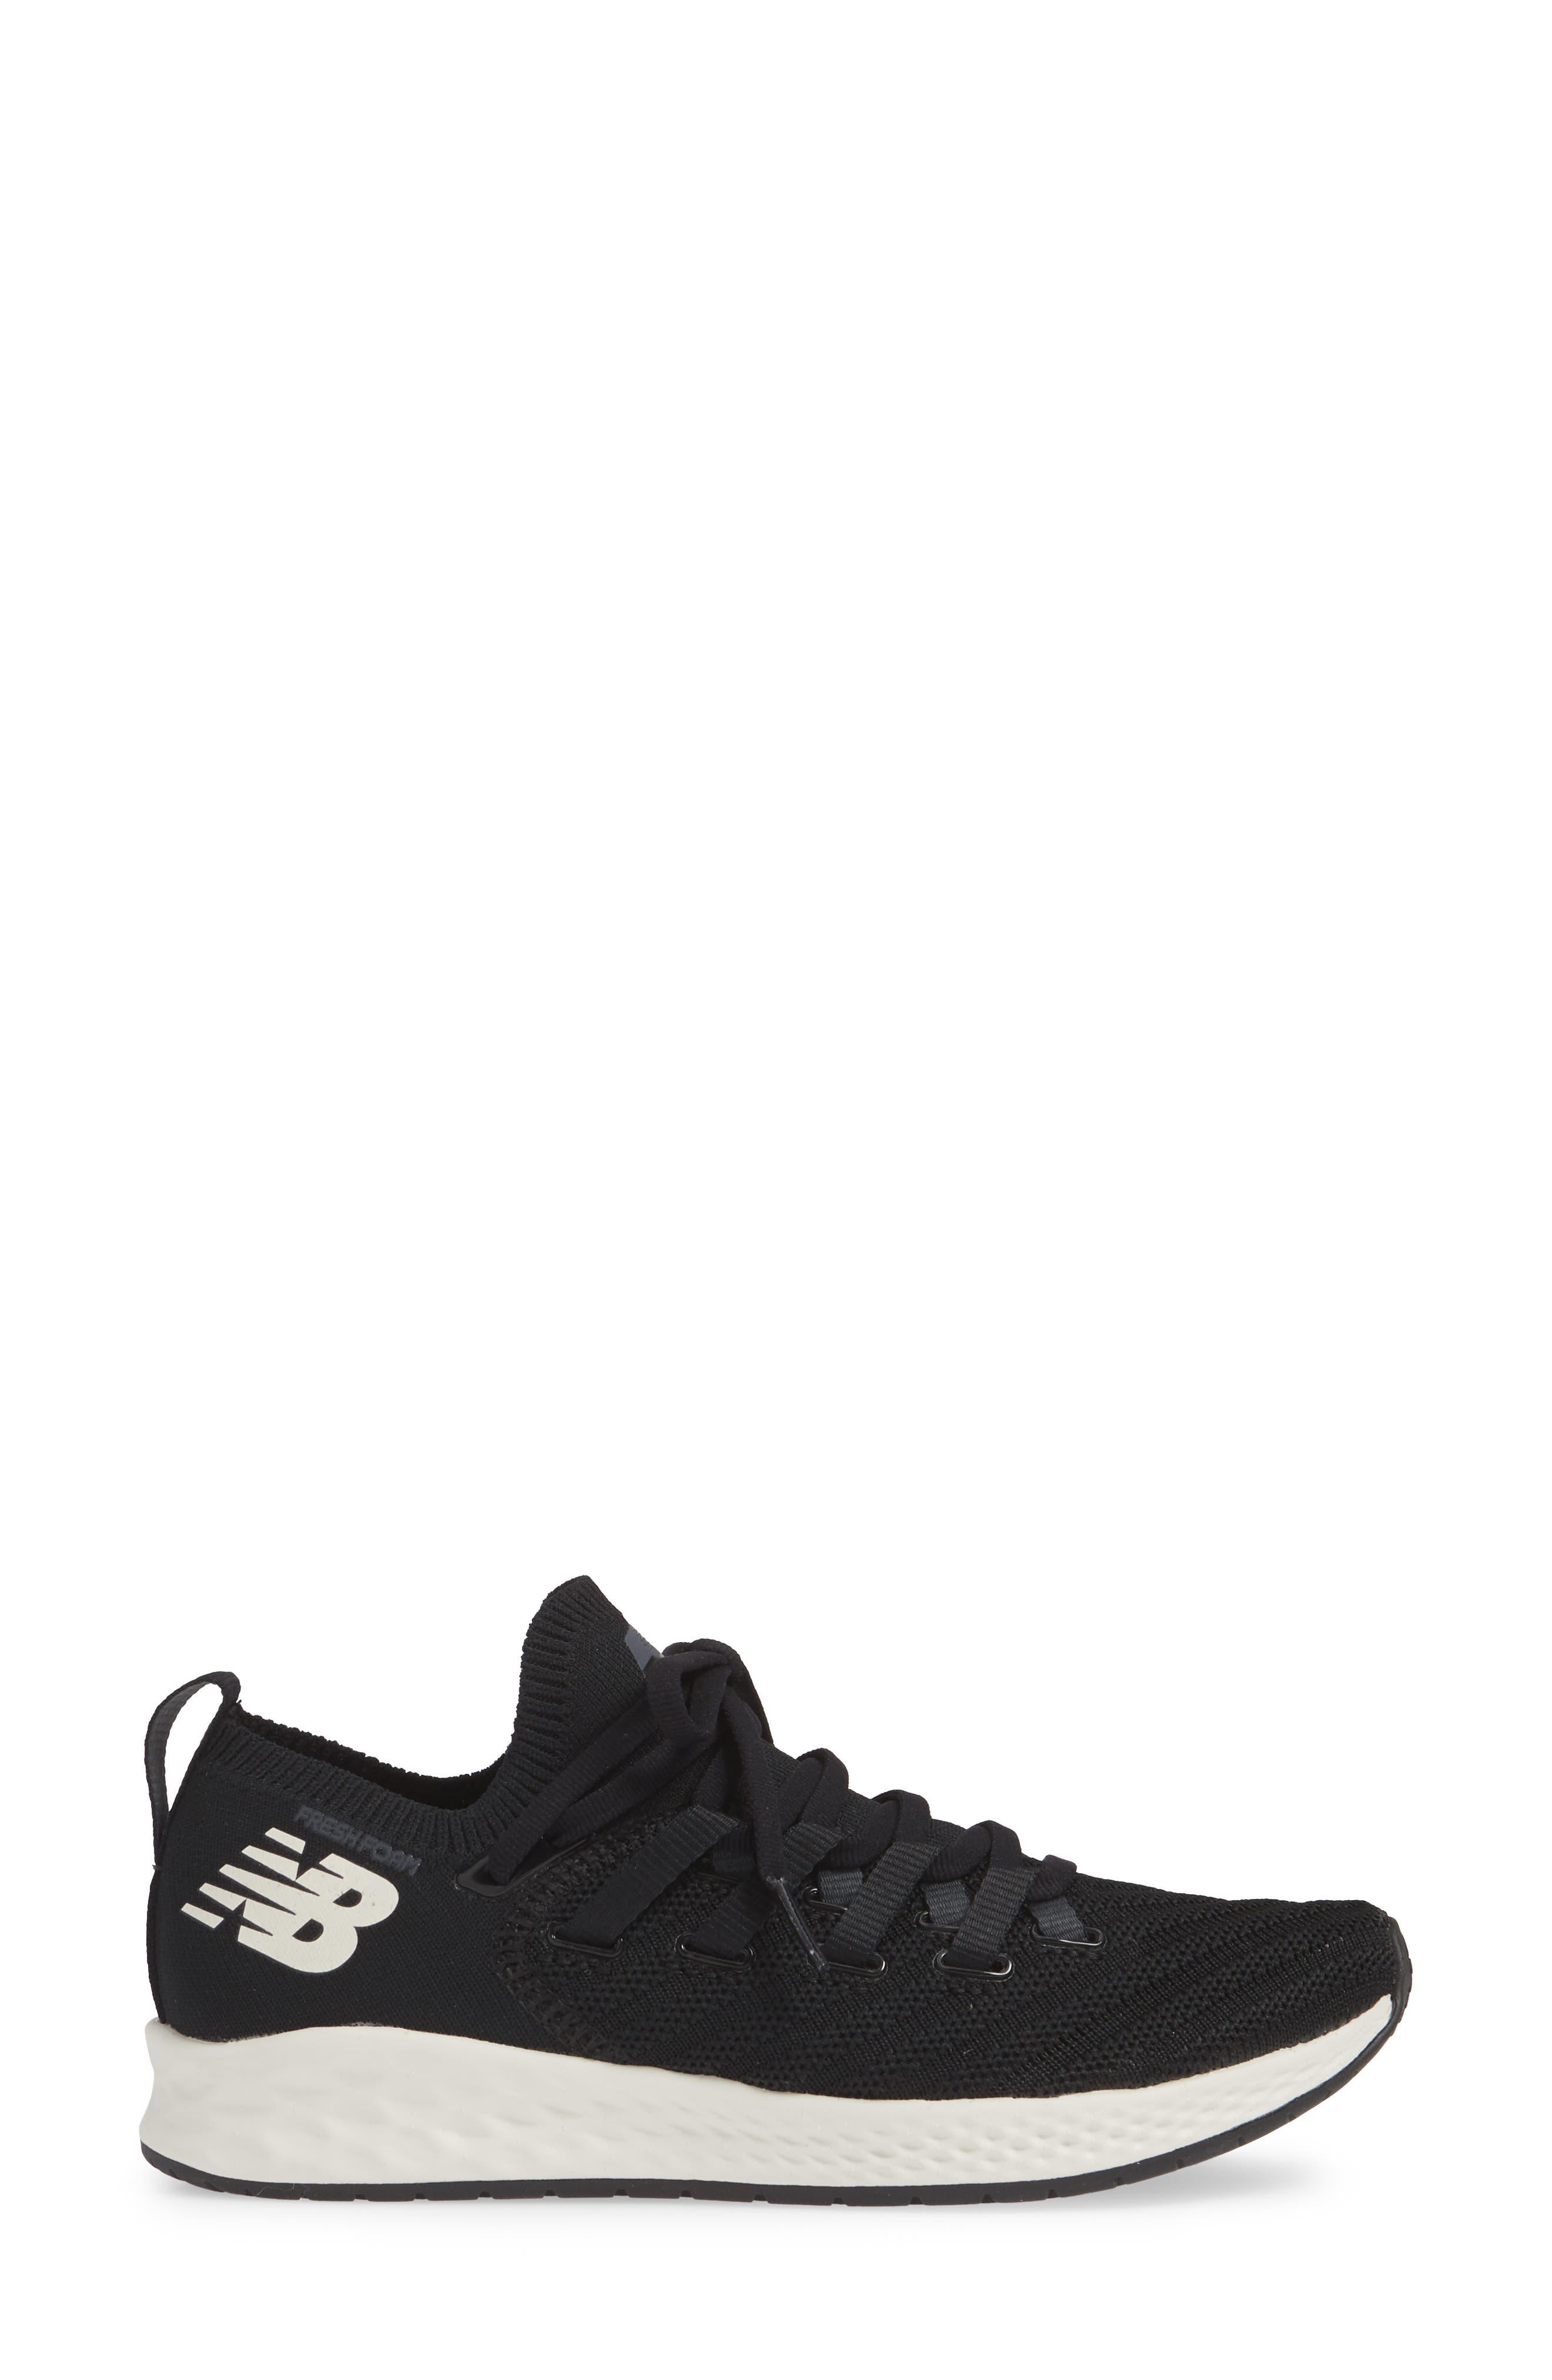 Fresh Foam Zante Training Shoe,                             Alternate thumbnail 3, color,                             001